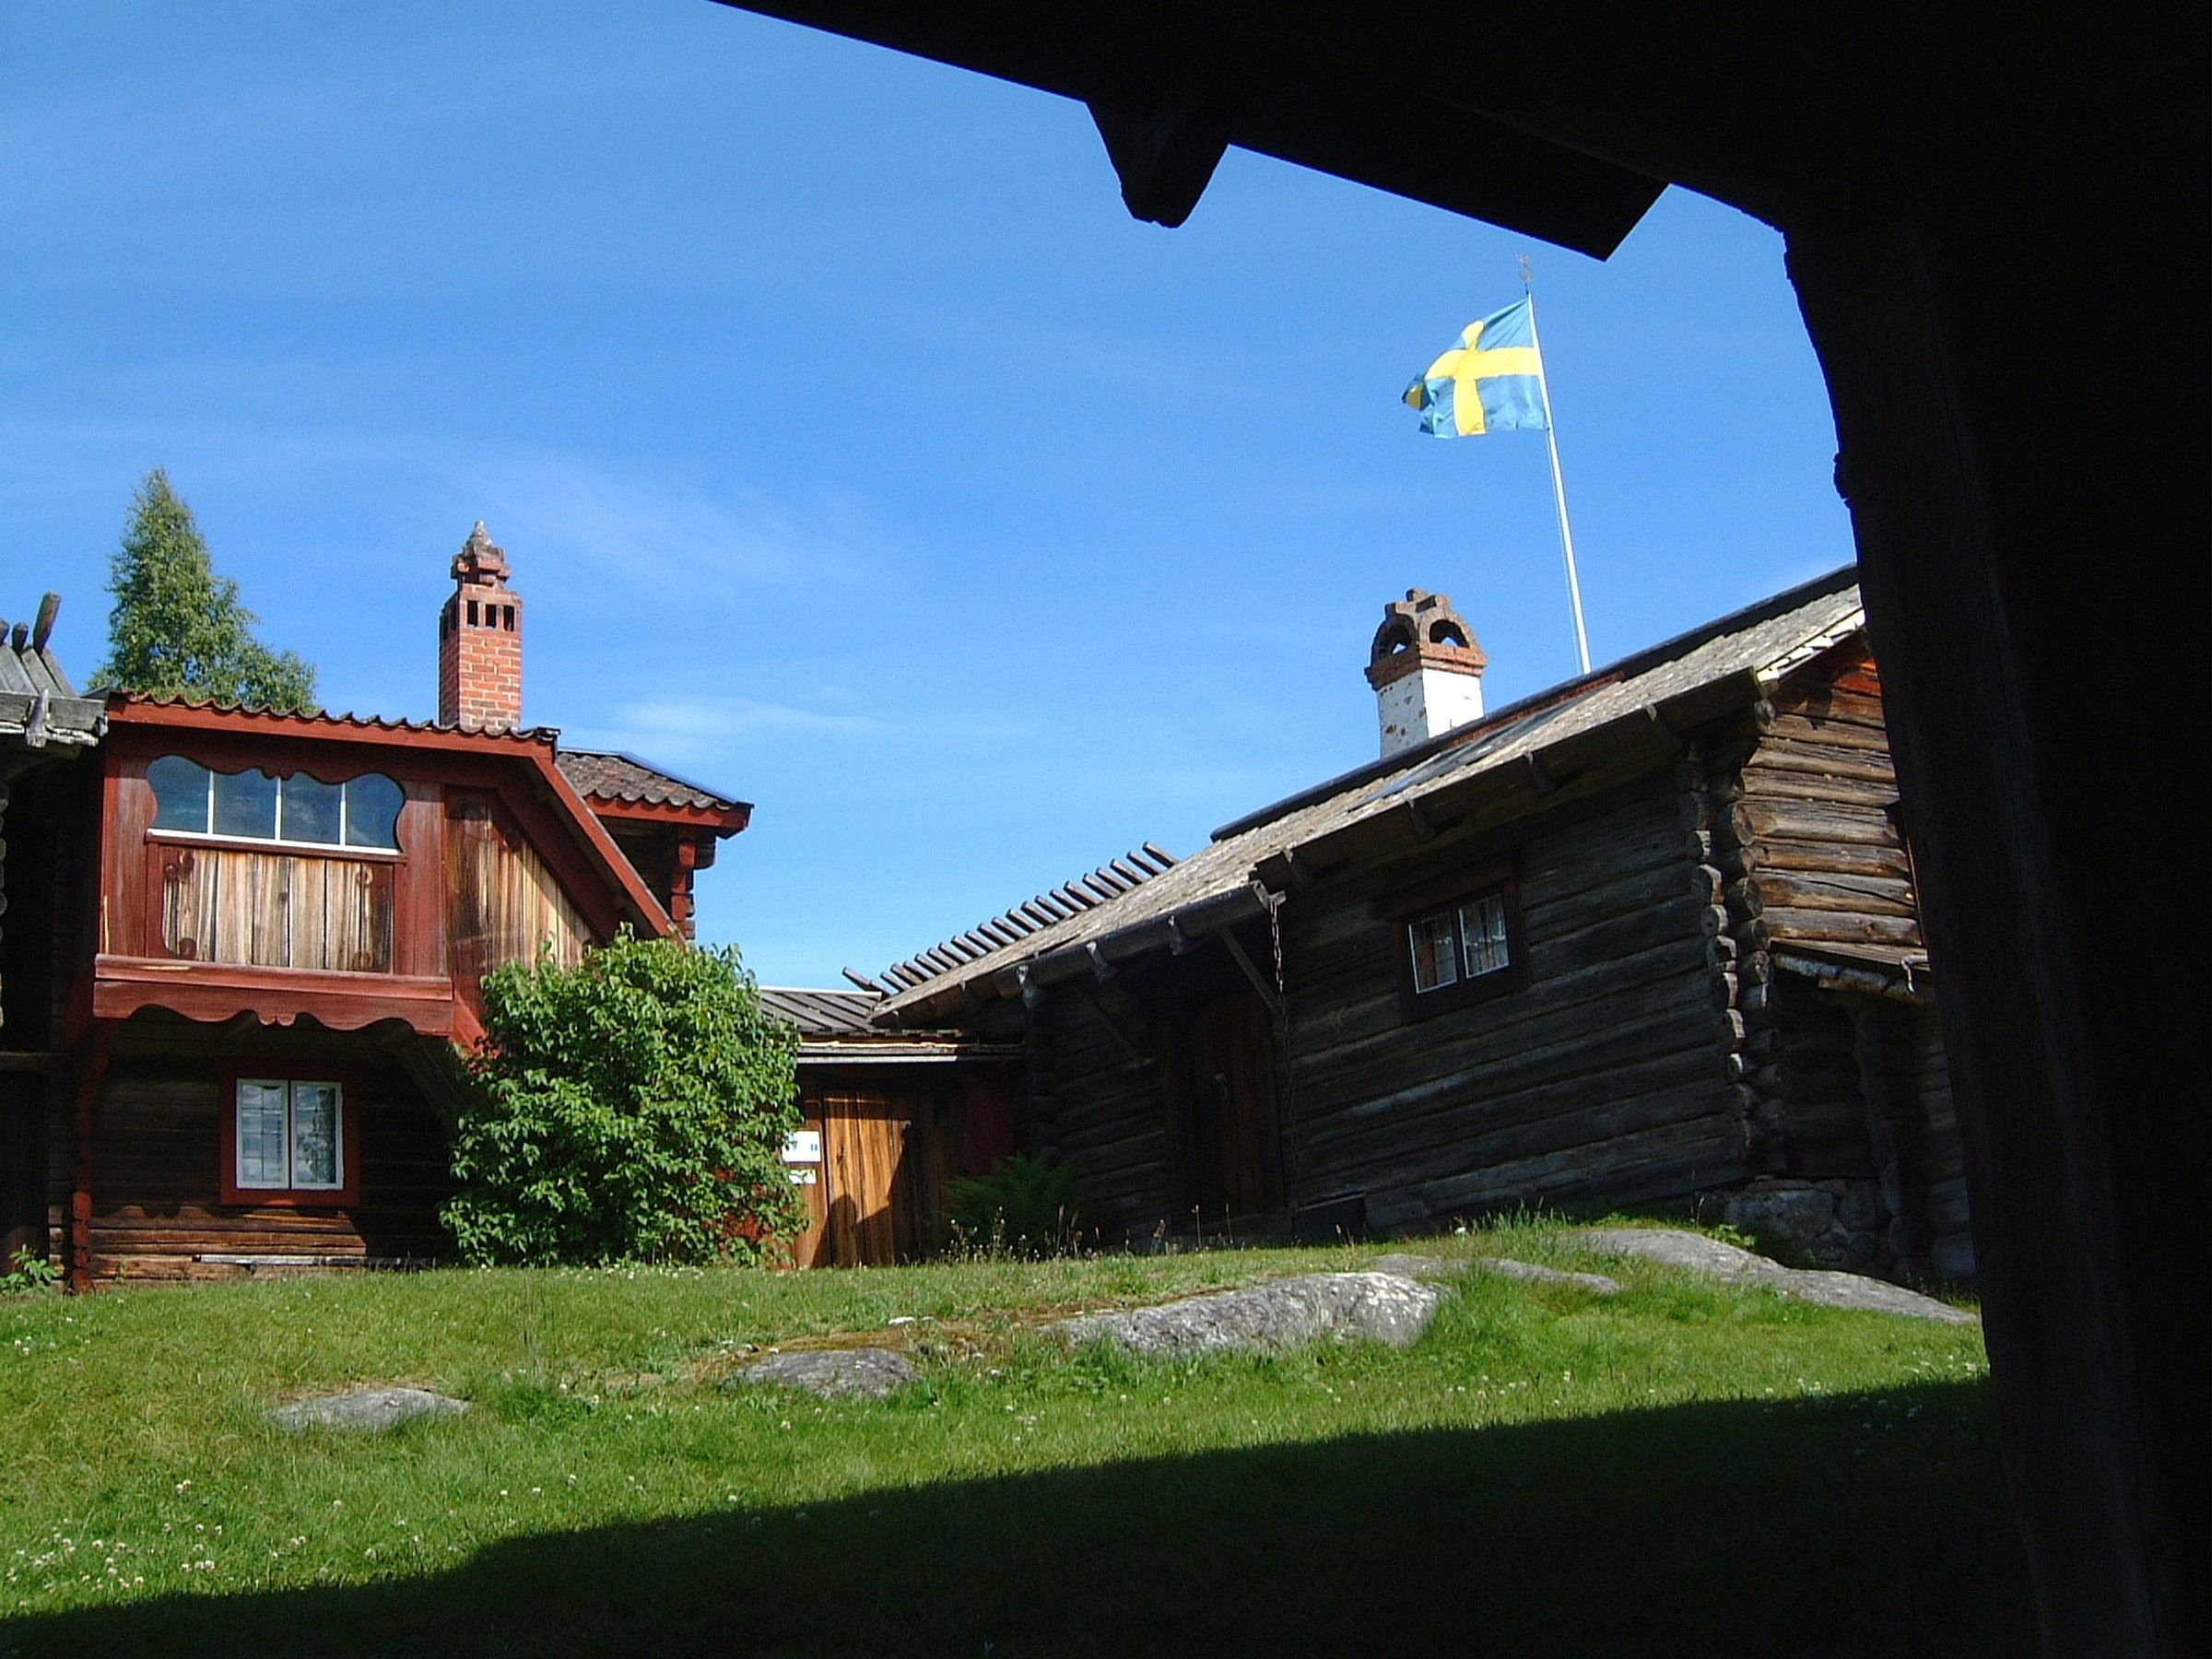 Guided tour of Holens Gammelgård